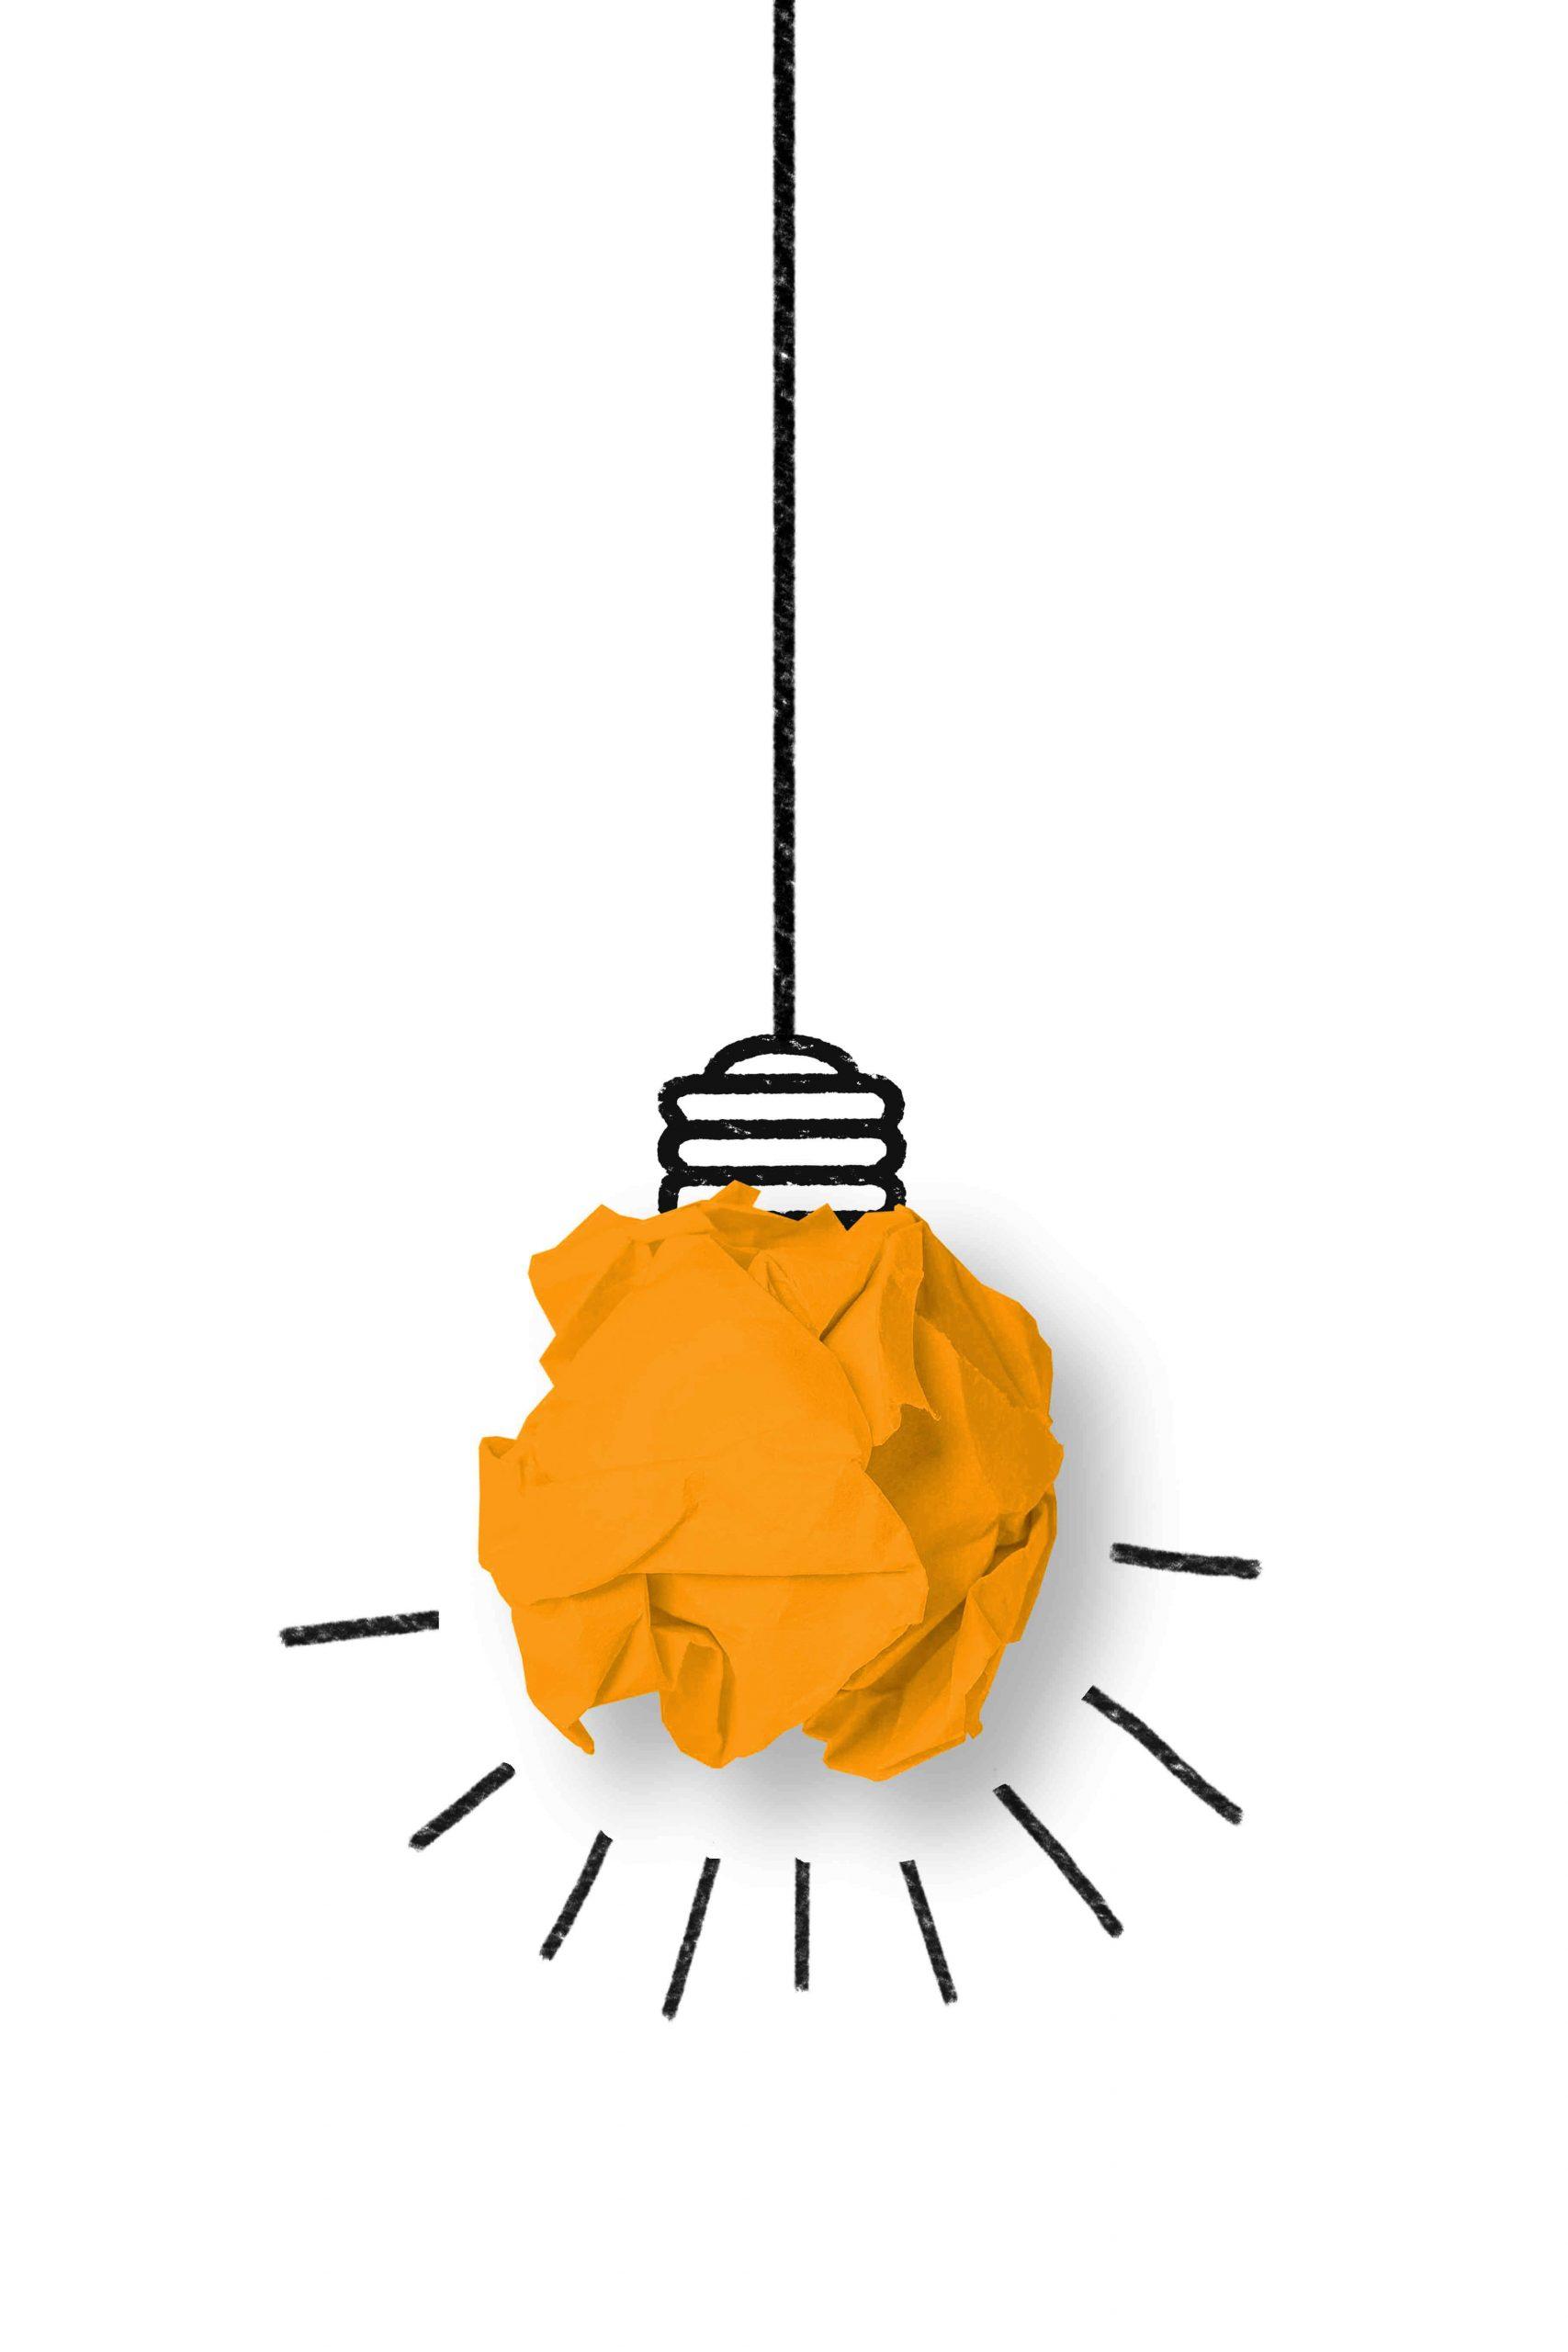 Small Business Box light bulb